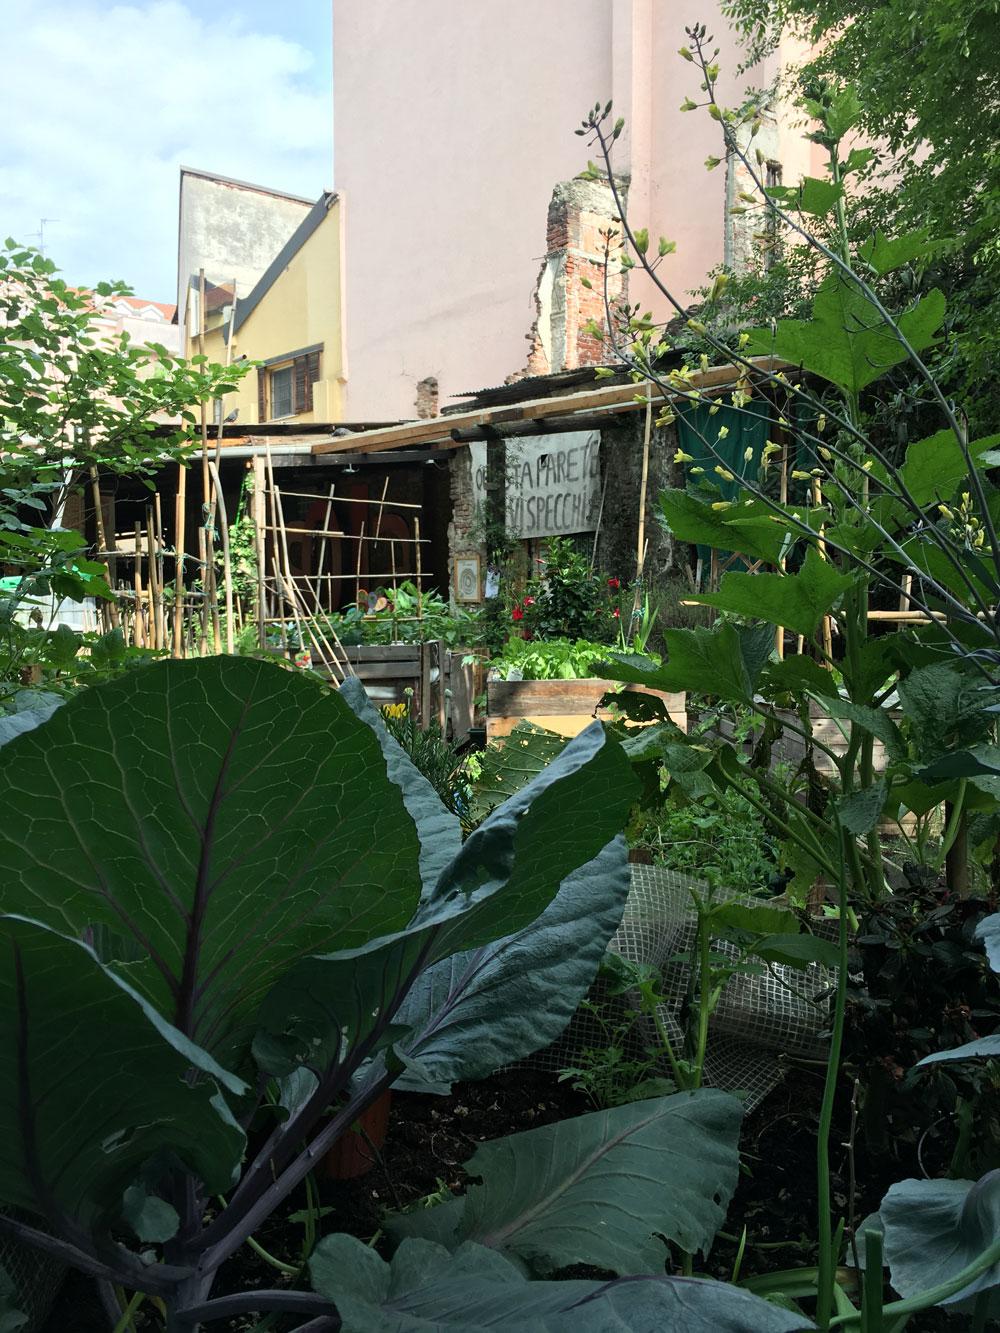 Milano-gardens6.jpg